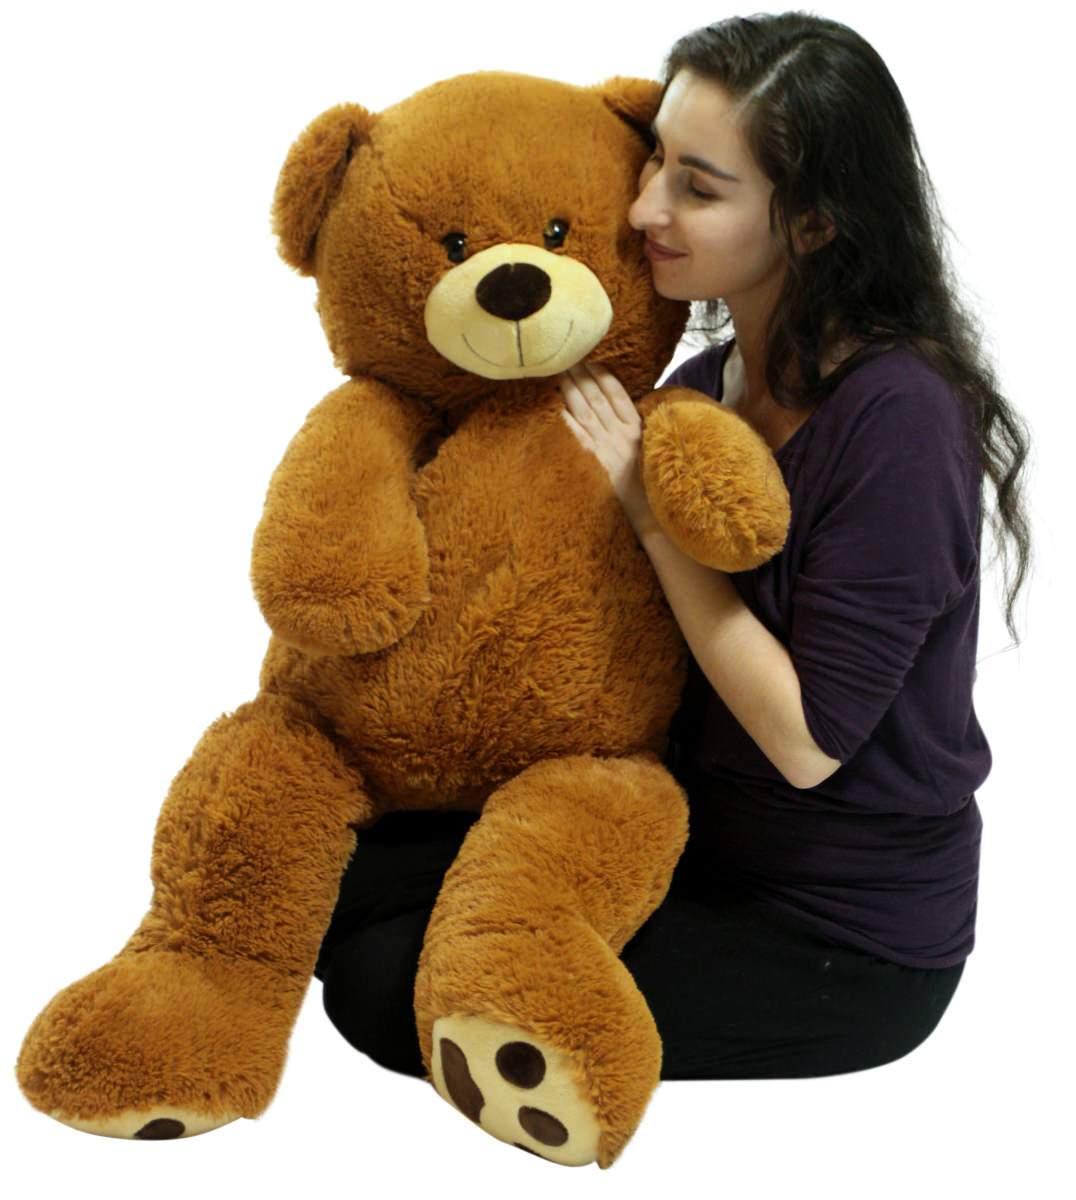 Big Plush 3 Foot Teddy Bear Extra Soft 36 Inch Honey Brown Jumbo